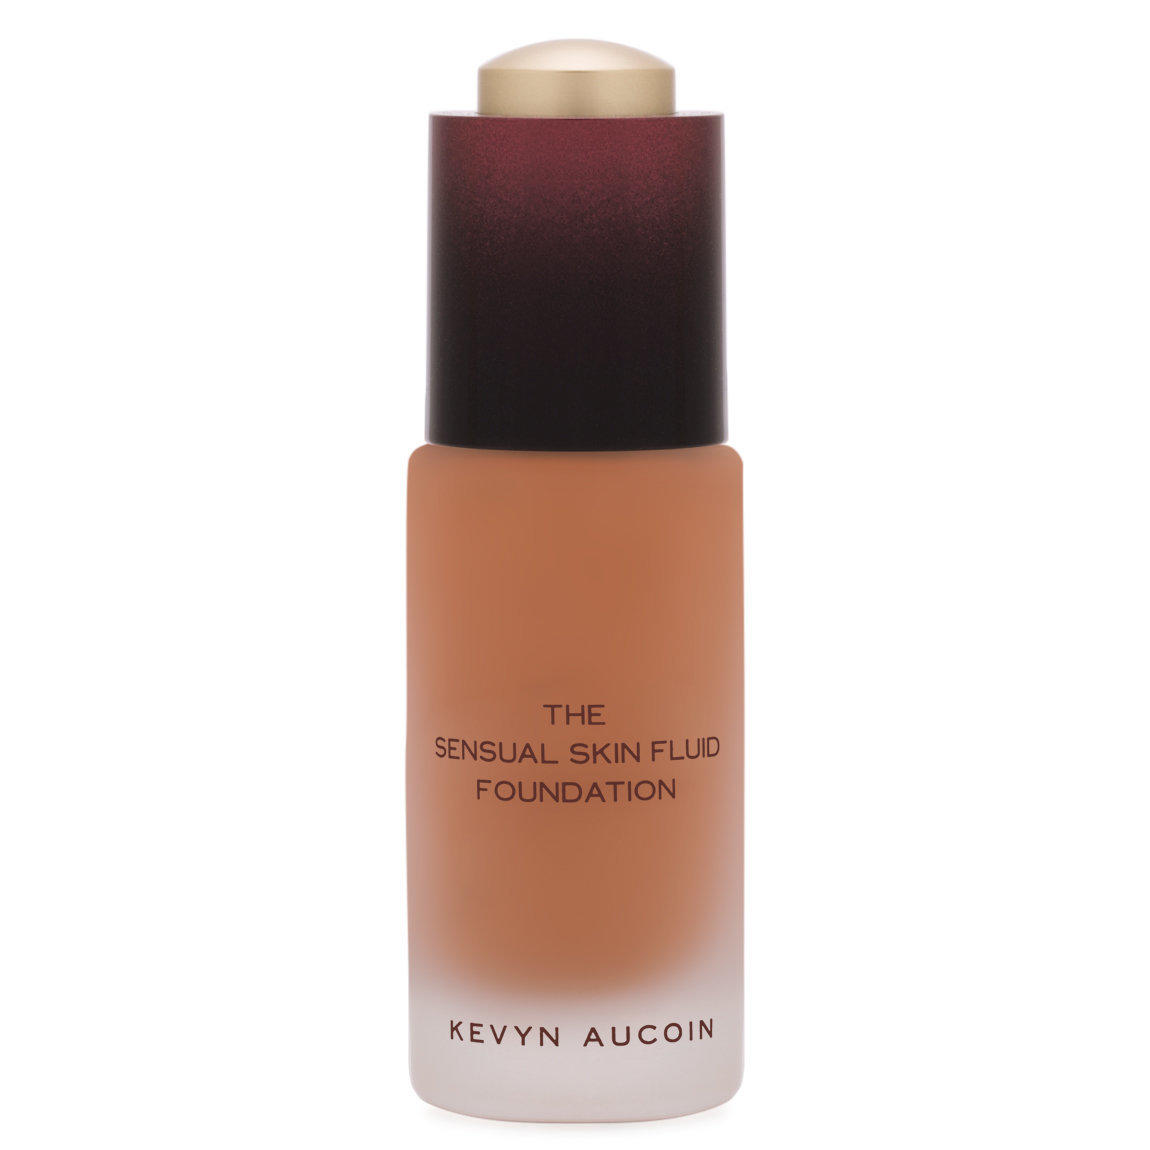 Kevyn Aucoin The Sensual Skin Fluid Foundation SF14